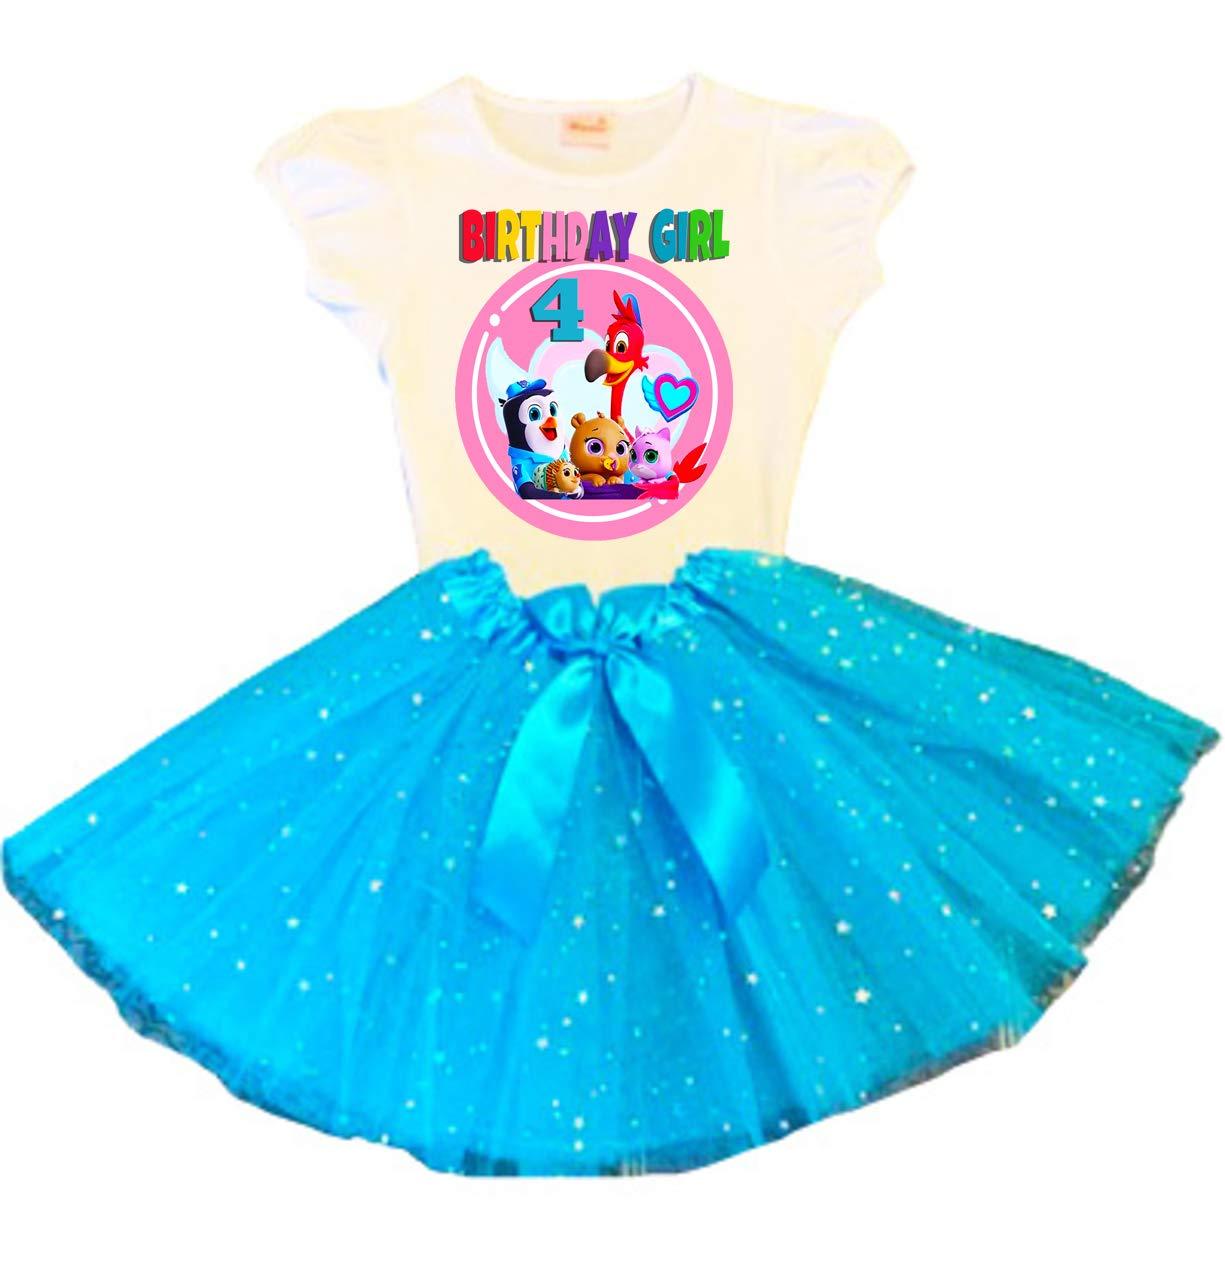 T.O.T.S Birthday Tutu 4th Birthday Party Dress Turquoise Tutu Outfit Shirt